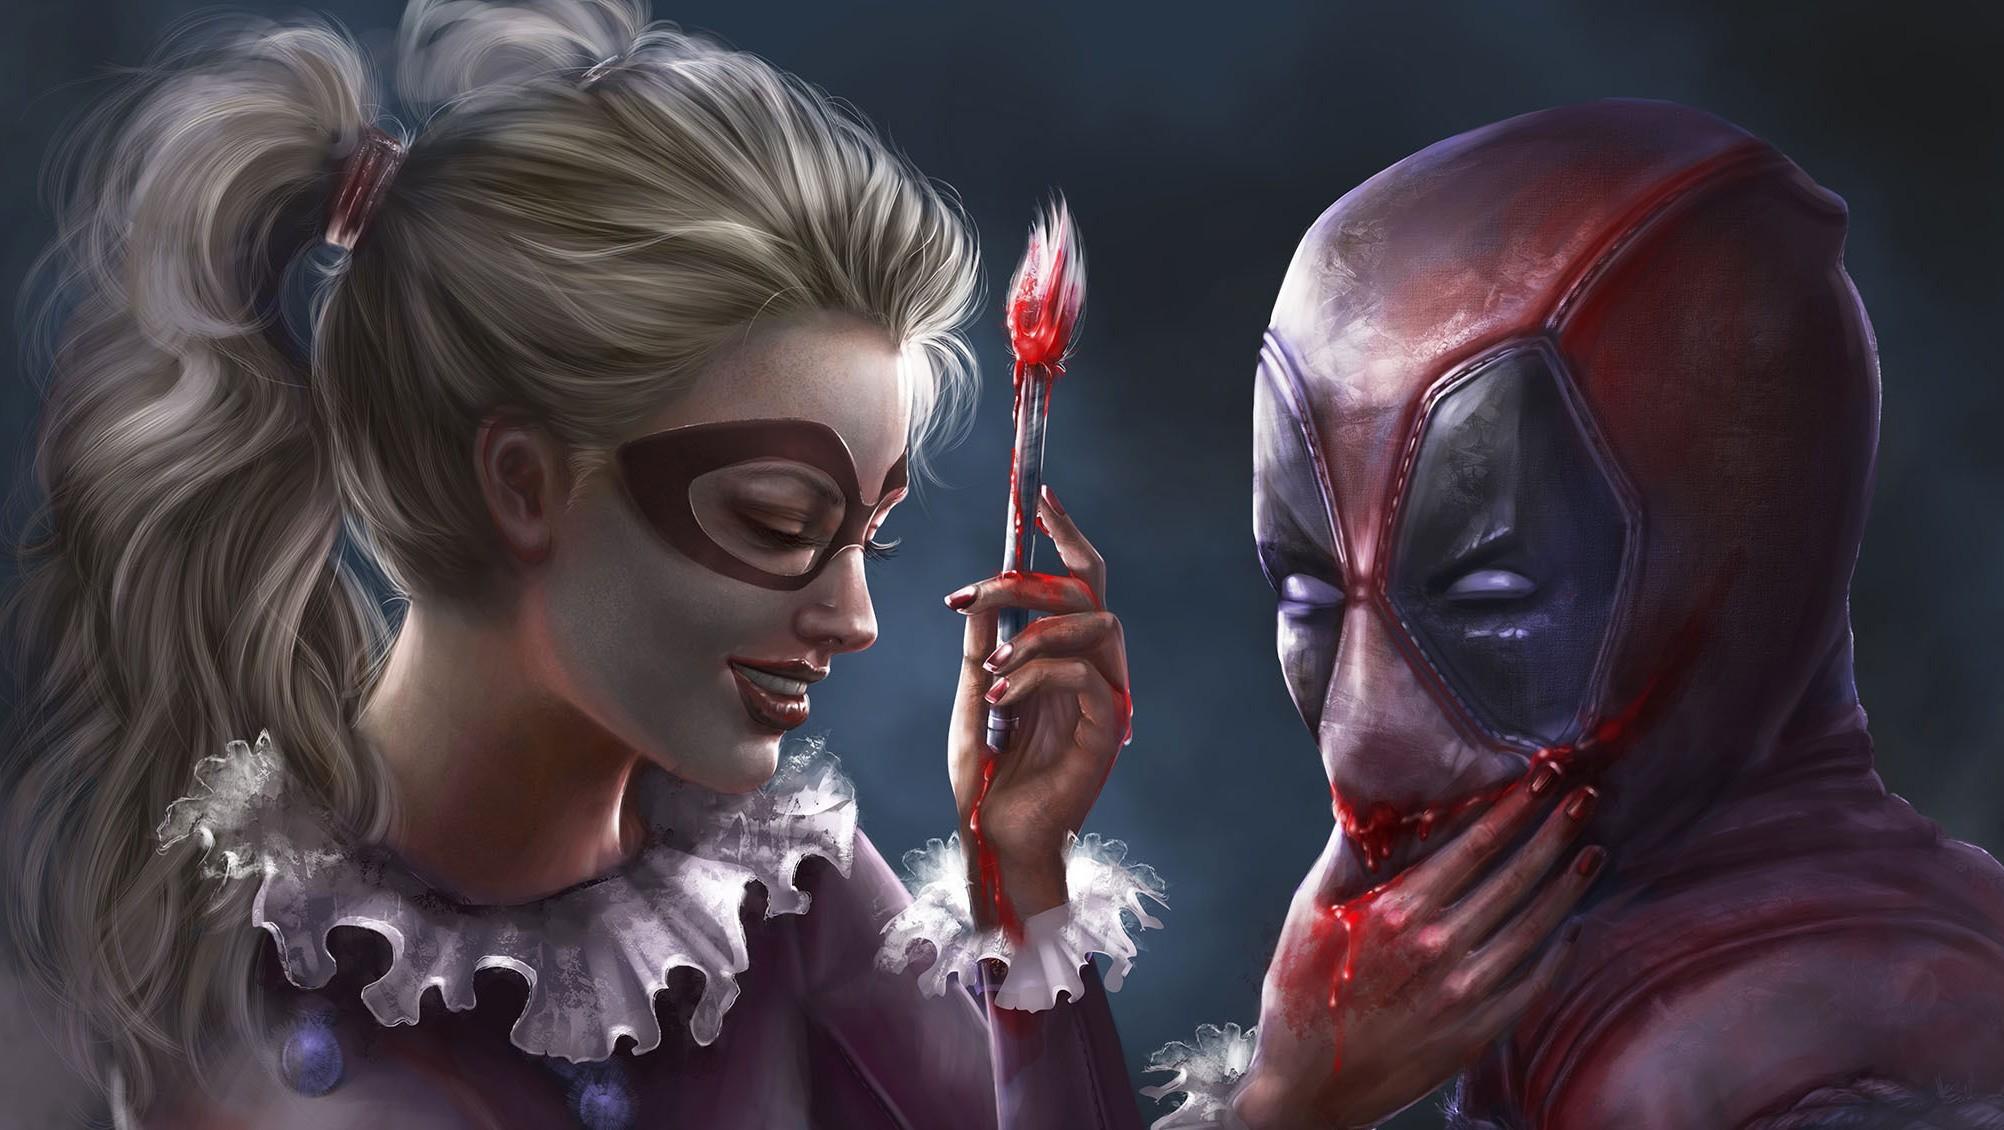 Harley Quinn, Deadpool, Artwork Wallpapers HD / Desktop and Mobile  Backgrounds